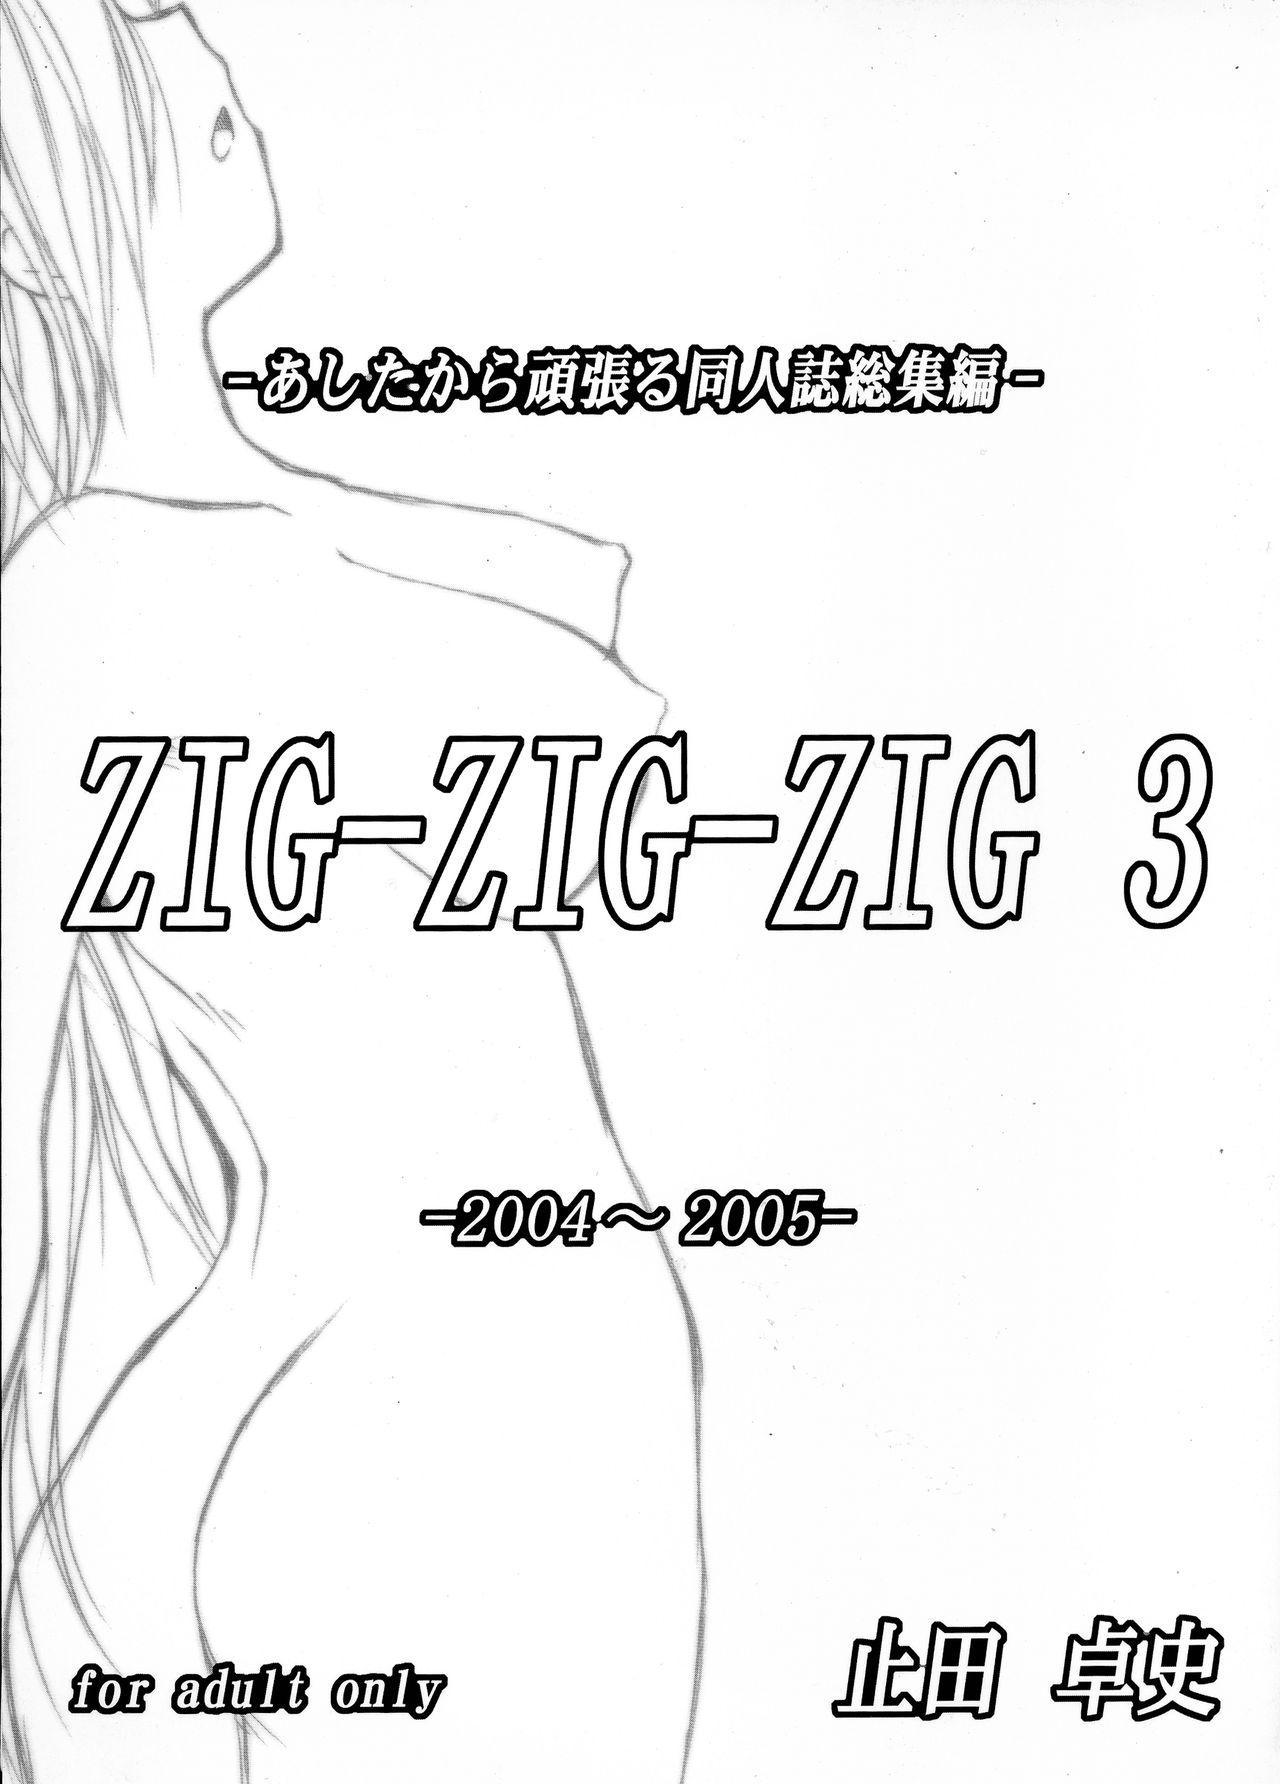 (C73) [ashitakara-ganbaru (Yameta Takashi)] ZIG-ZIG-ZIG 3 -2004~2005- (Various) 0